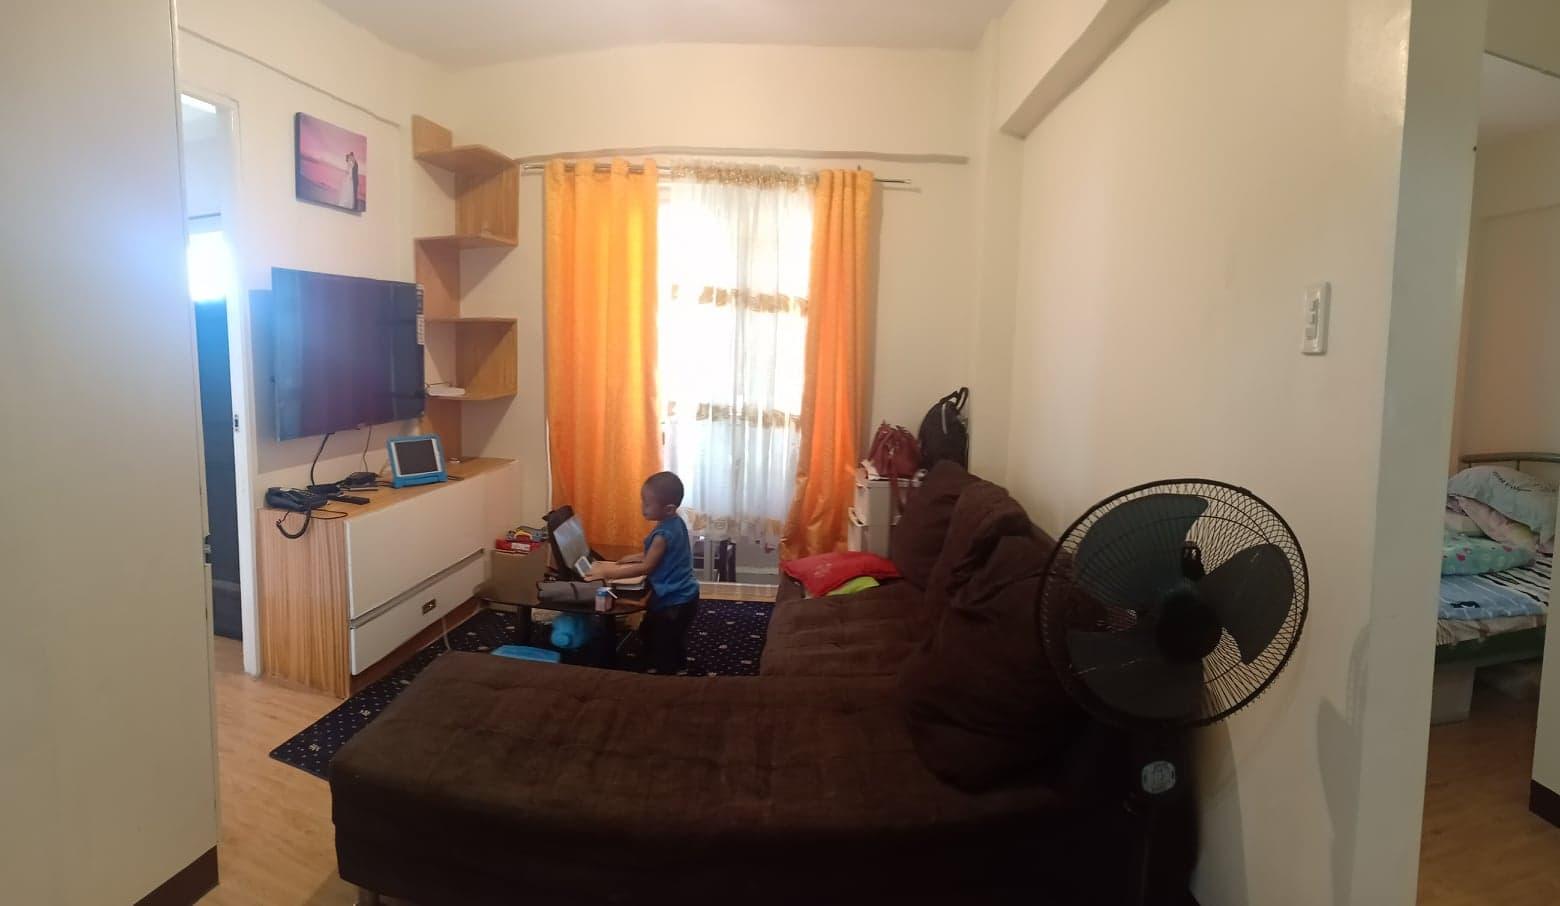 Soleta family's condo, before renovation